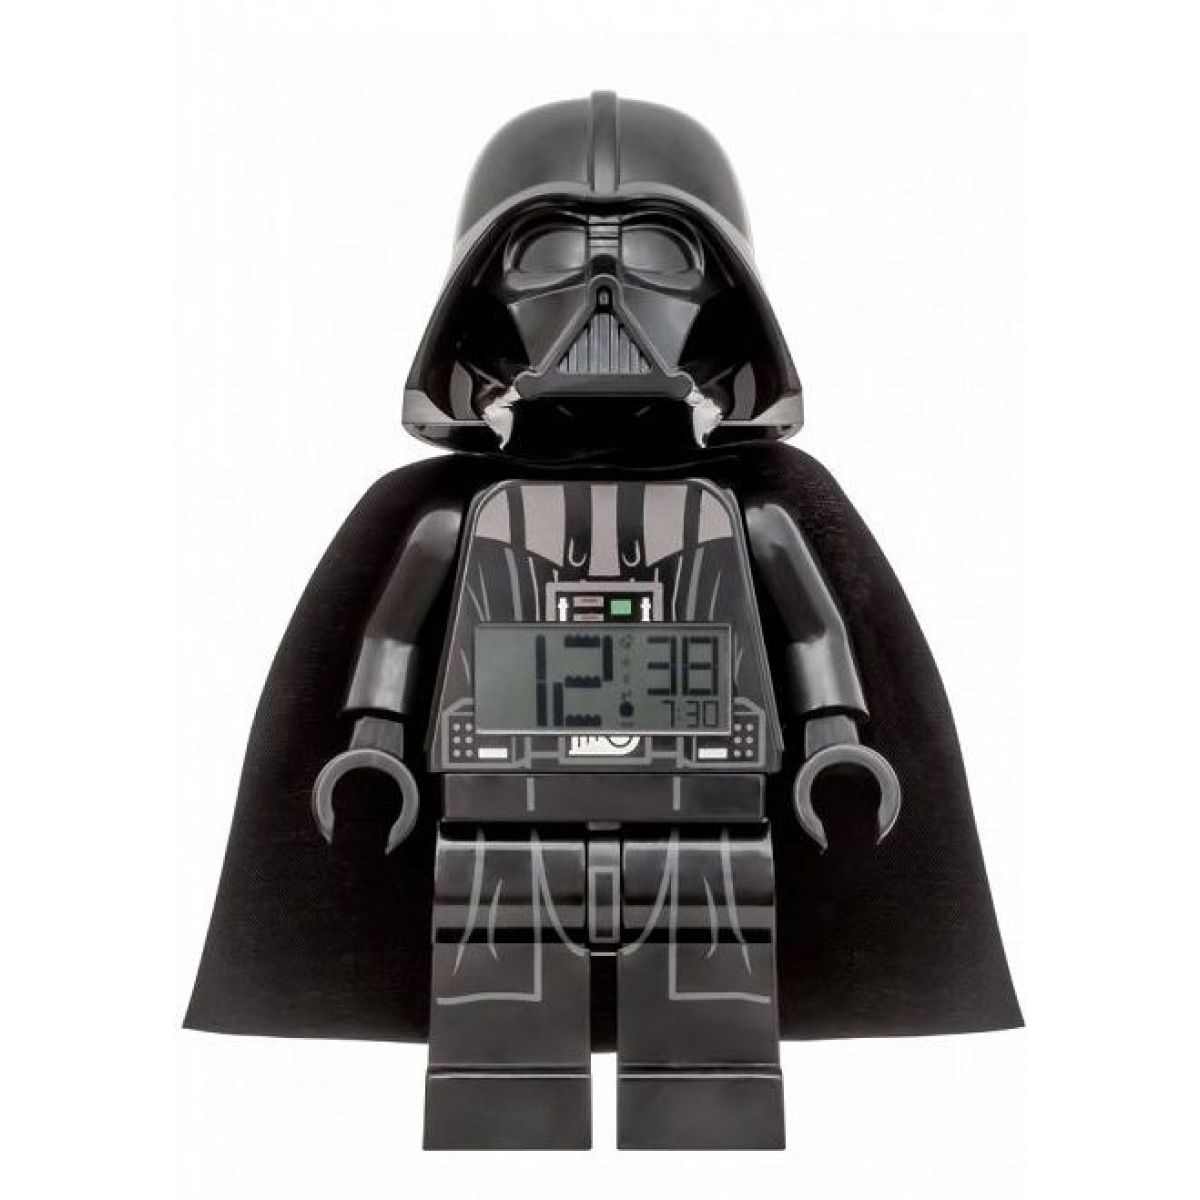 LEGO® Star Wars Darth Vader (2019) - hodiny s budíkem